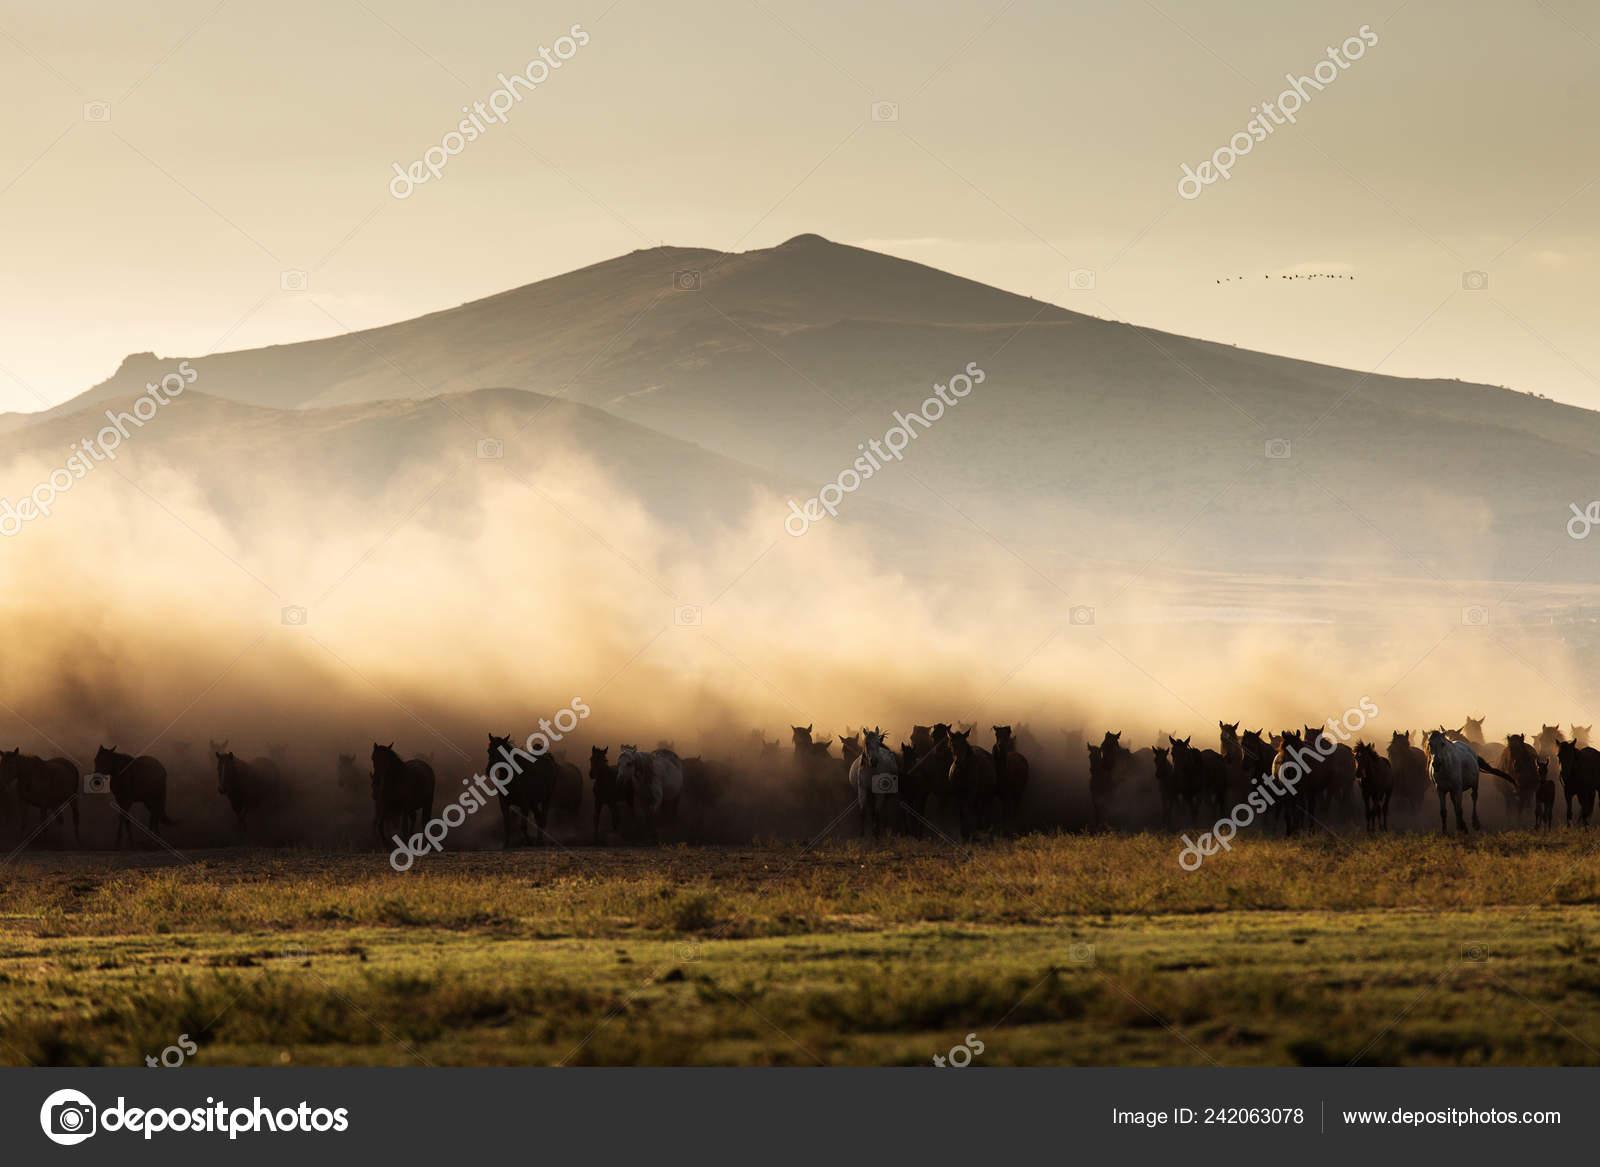 Landscape Wild Horses Running Sunset Dust Background Stock Photo C Danmir12 242063078